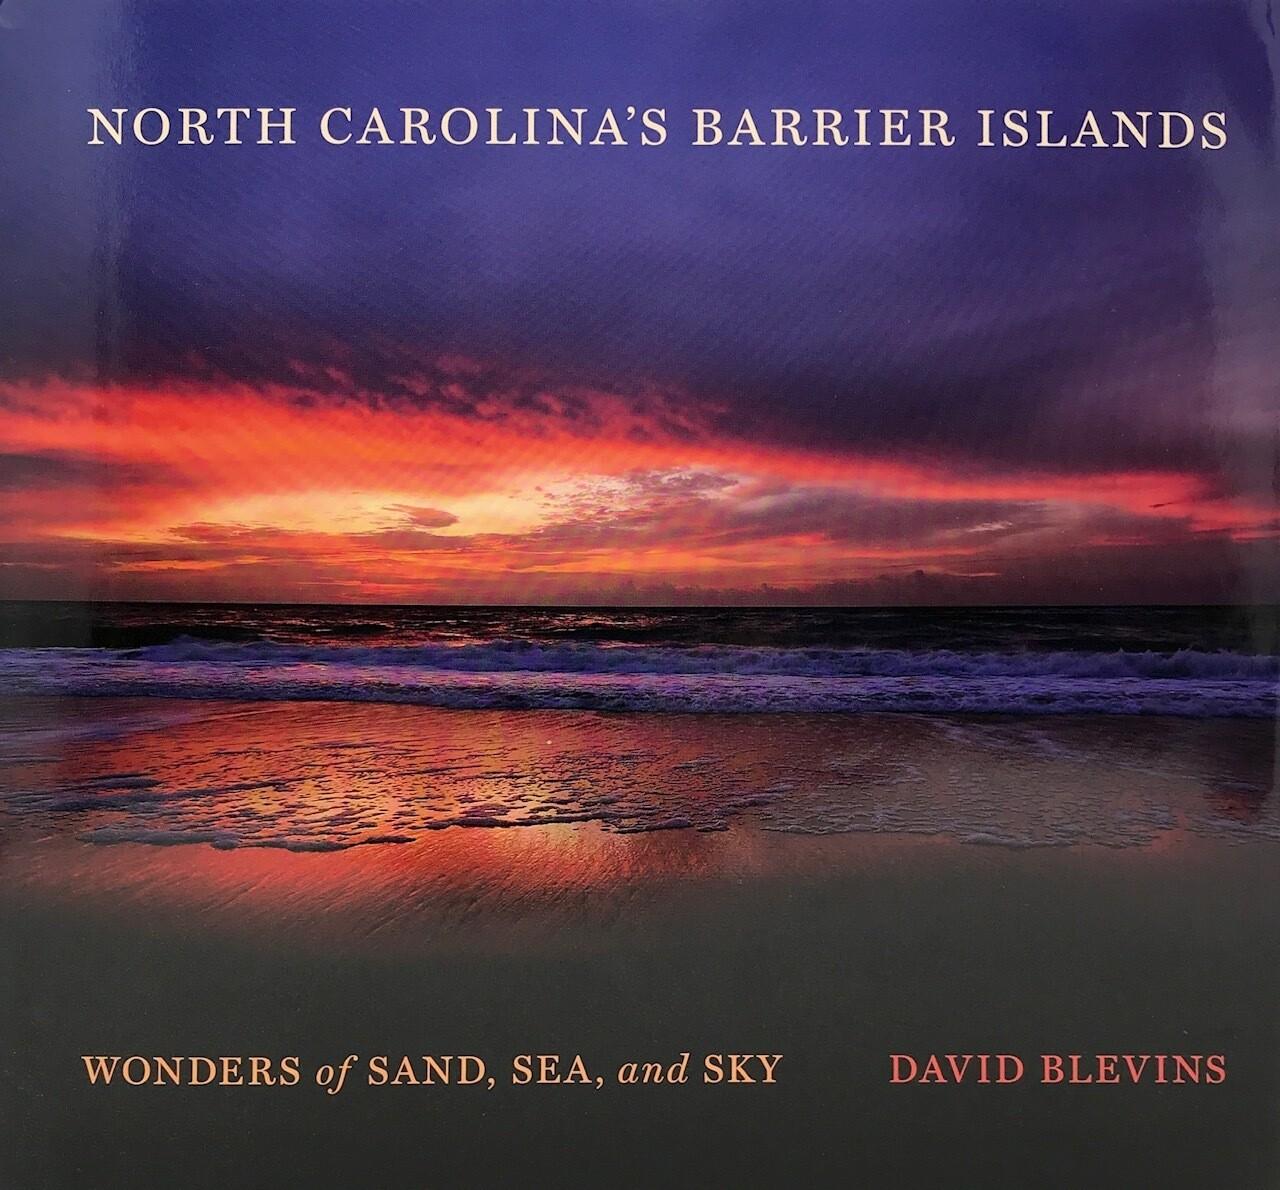 North Carolina's Barrier Islands - Wonders of Sand, Sea, and Sky